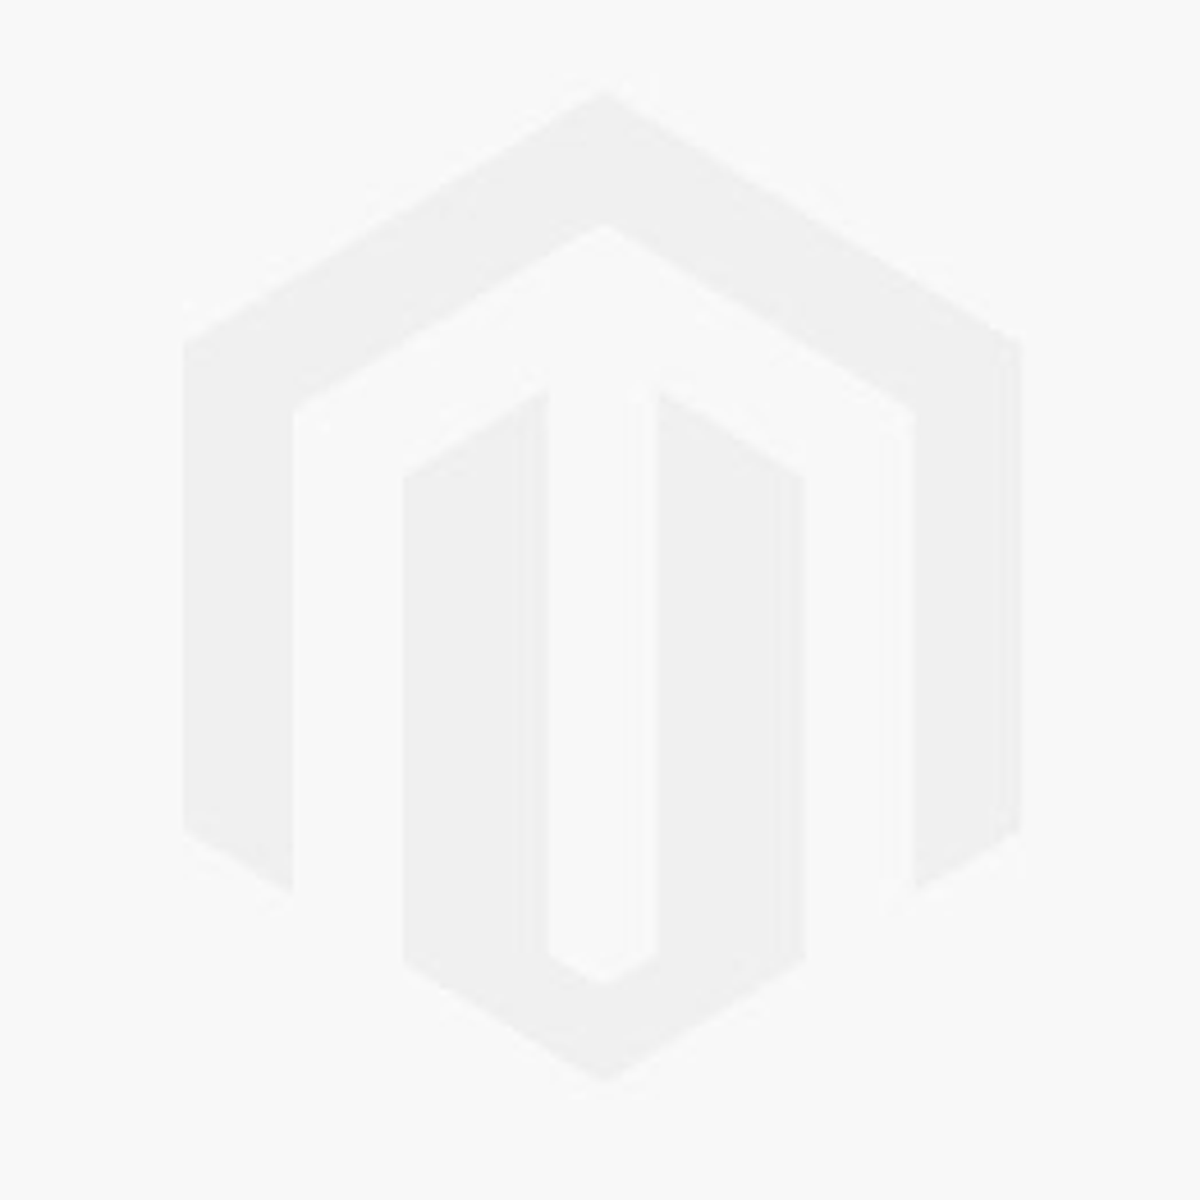 Blooming Hawaiian Linen Shirt - White/Blue